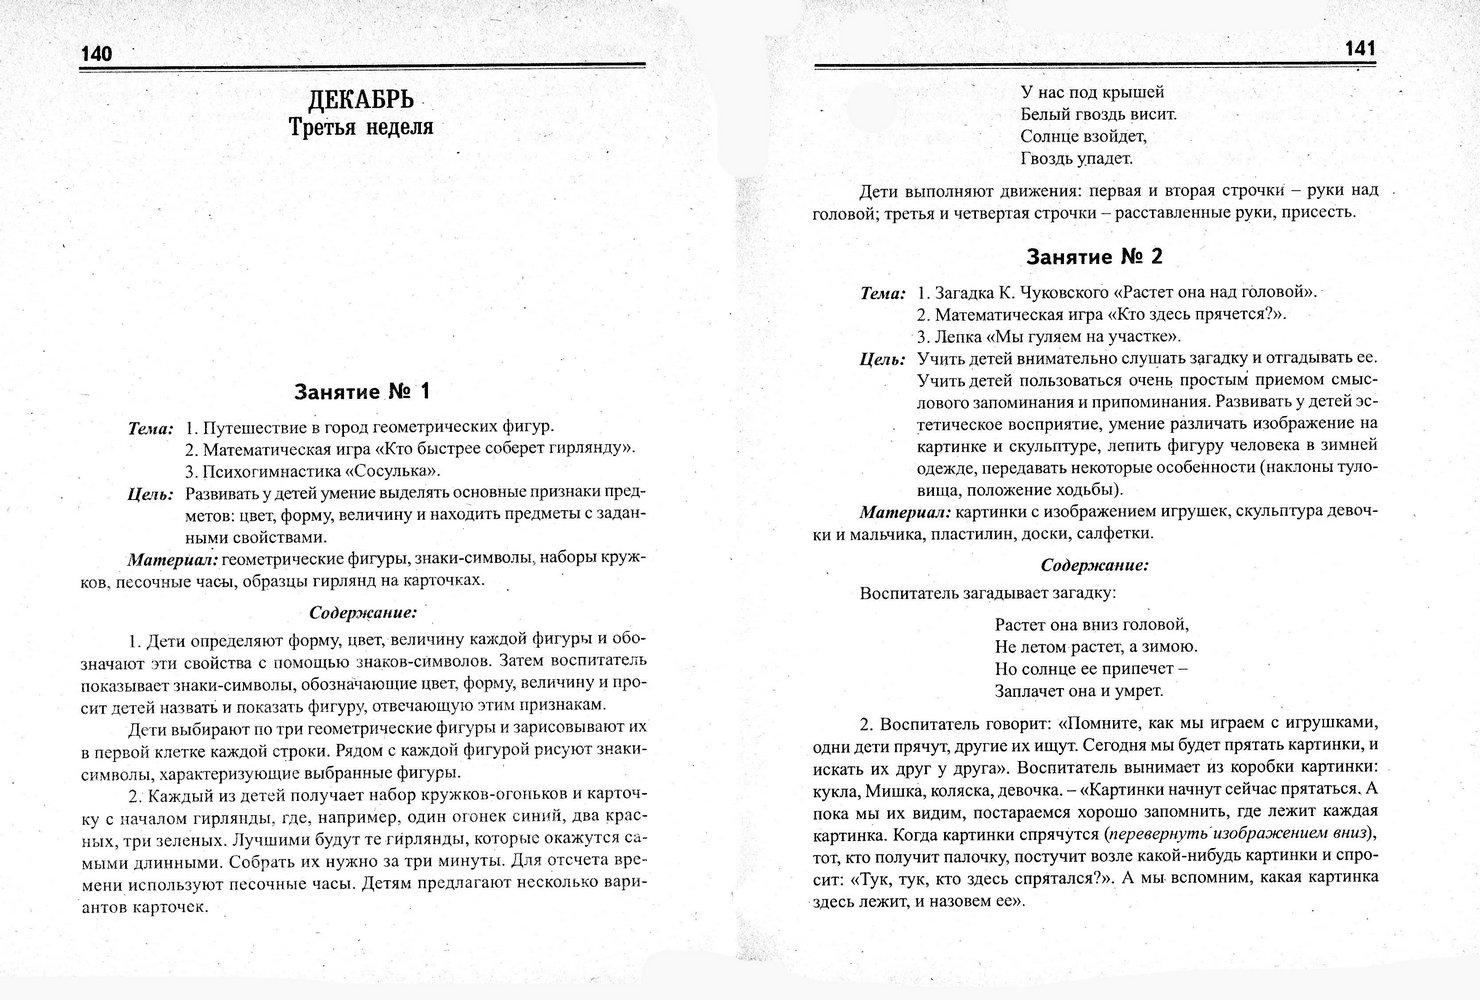 http://images.vfl.ru/ii/1367672076/efd43465/2276084.jpg